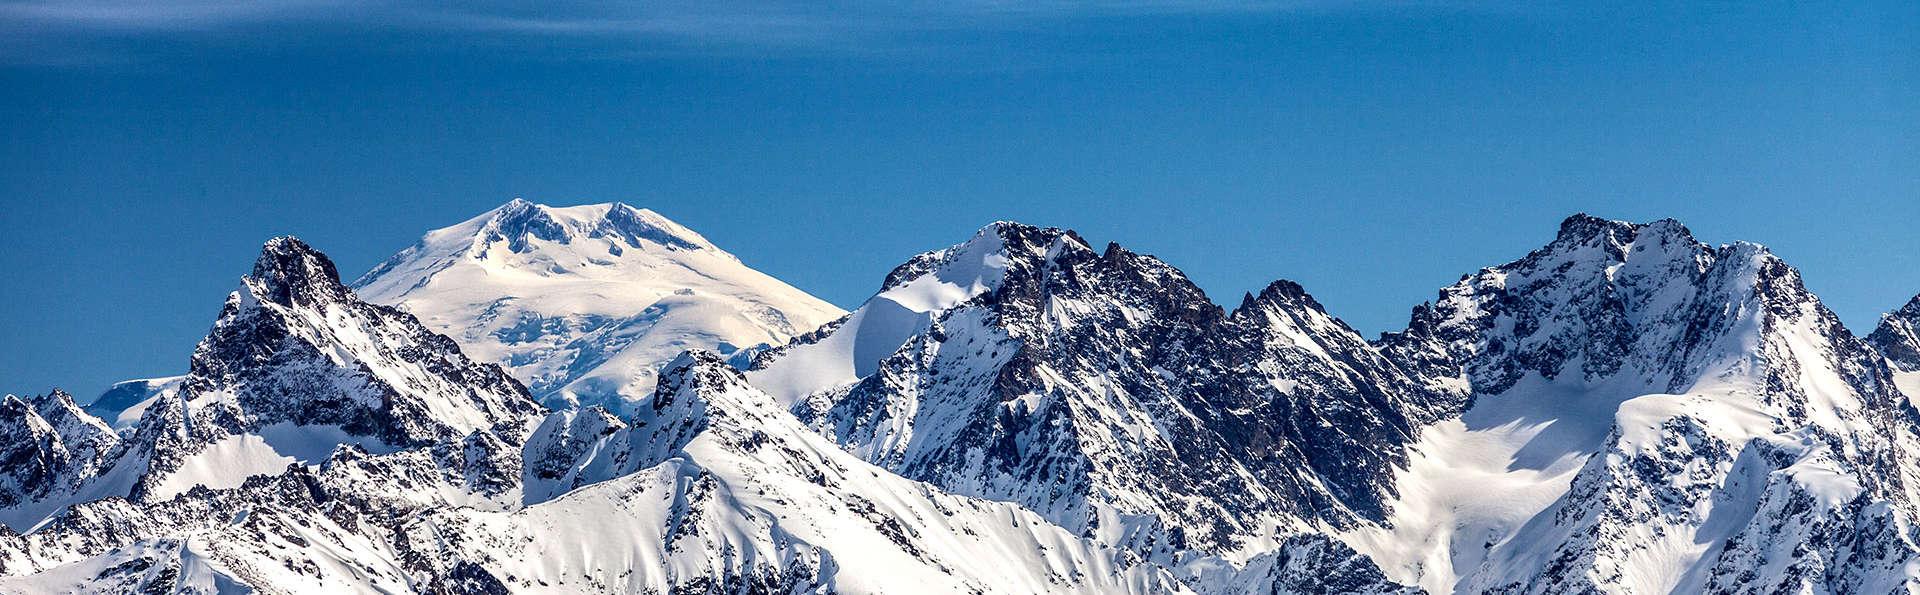 Chalet Liberty Mont Blanc - Edit_Destination2.jpg